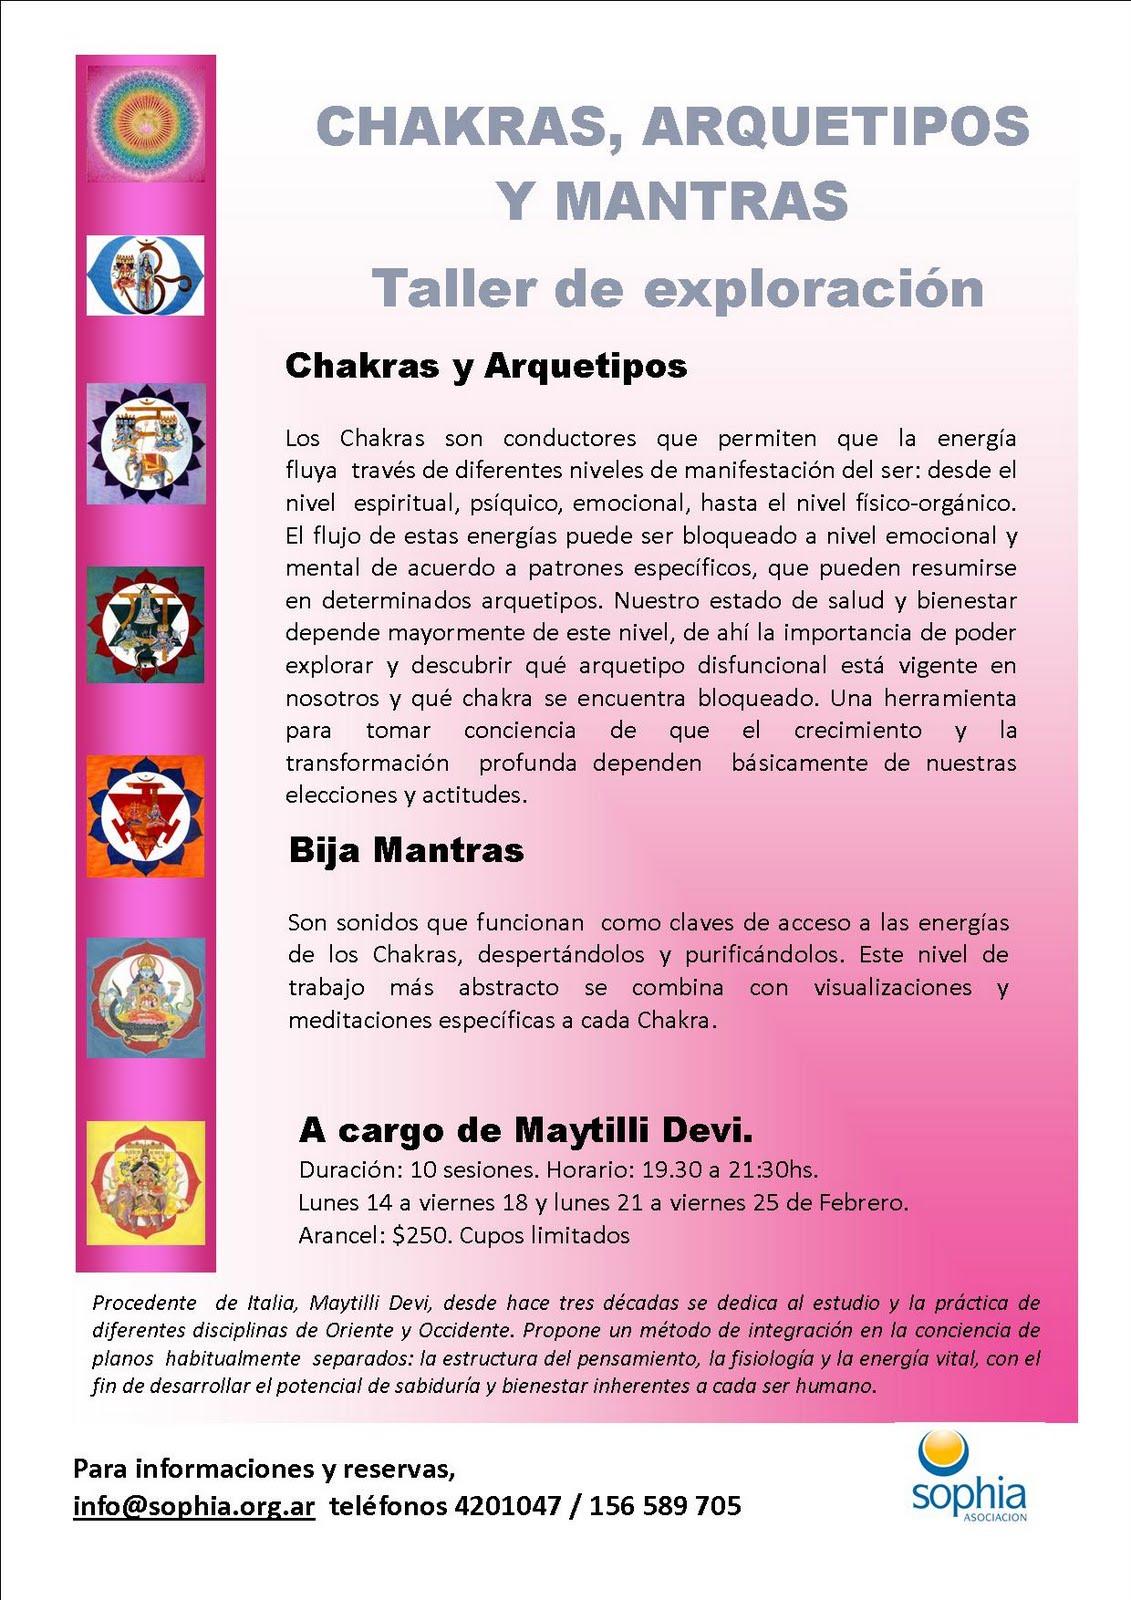 Maytilli Devi: Taller: Chakras, Arquetipos y Mantras